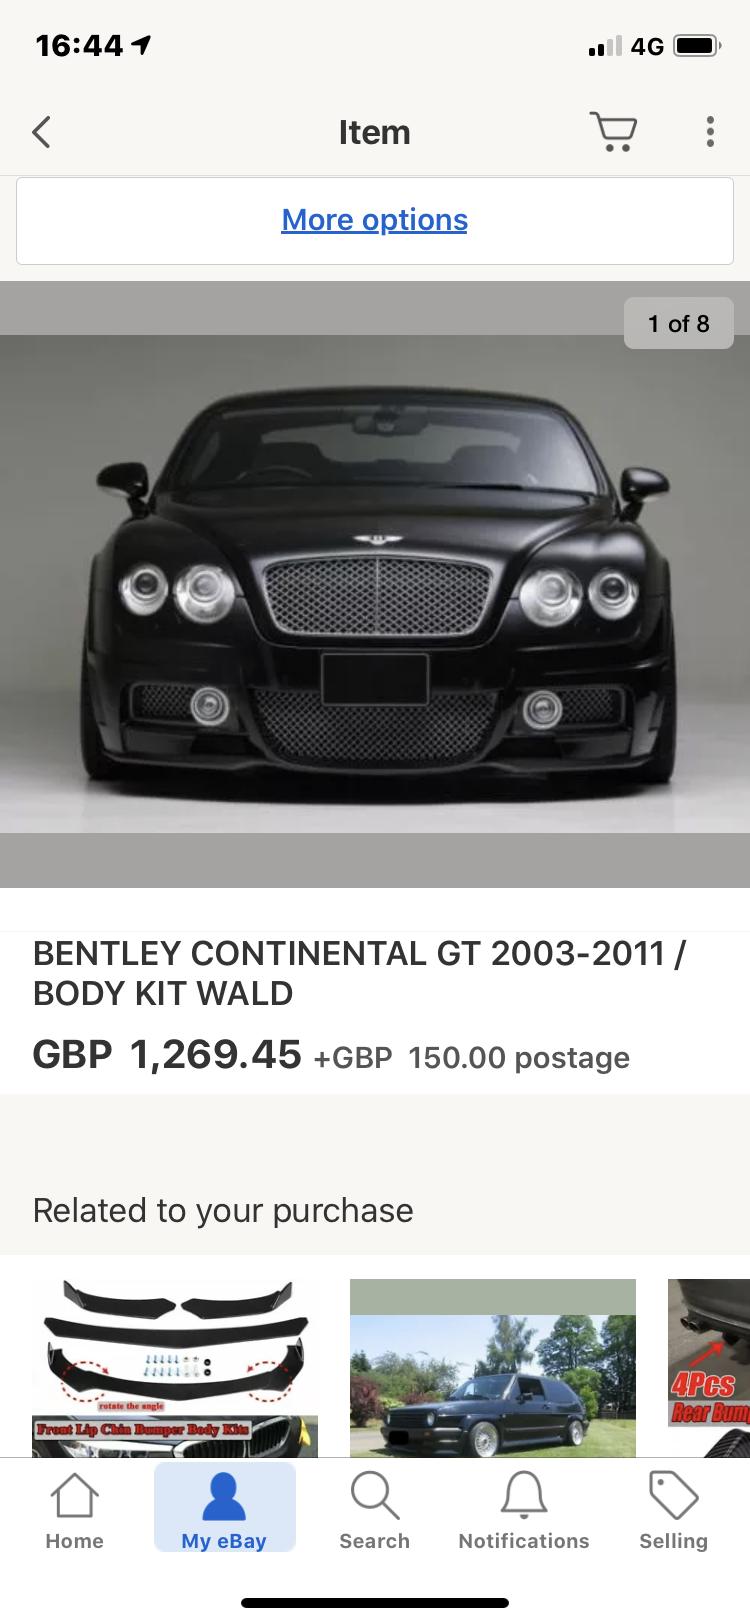 Bentley Wiring Diagram 6speedonline Porsche Forum And Luxury Car Resource